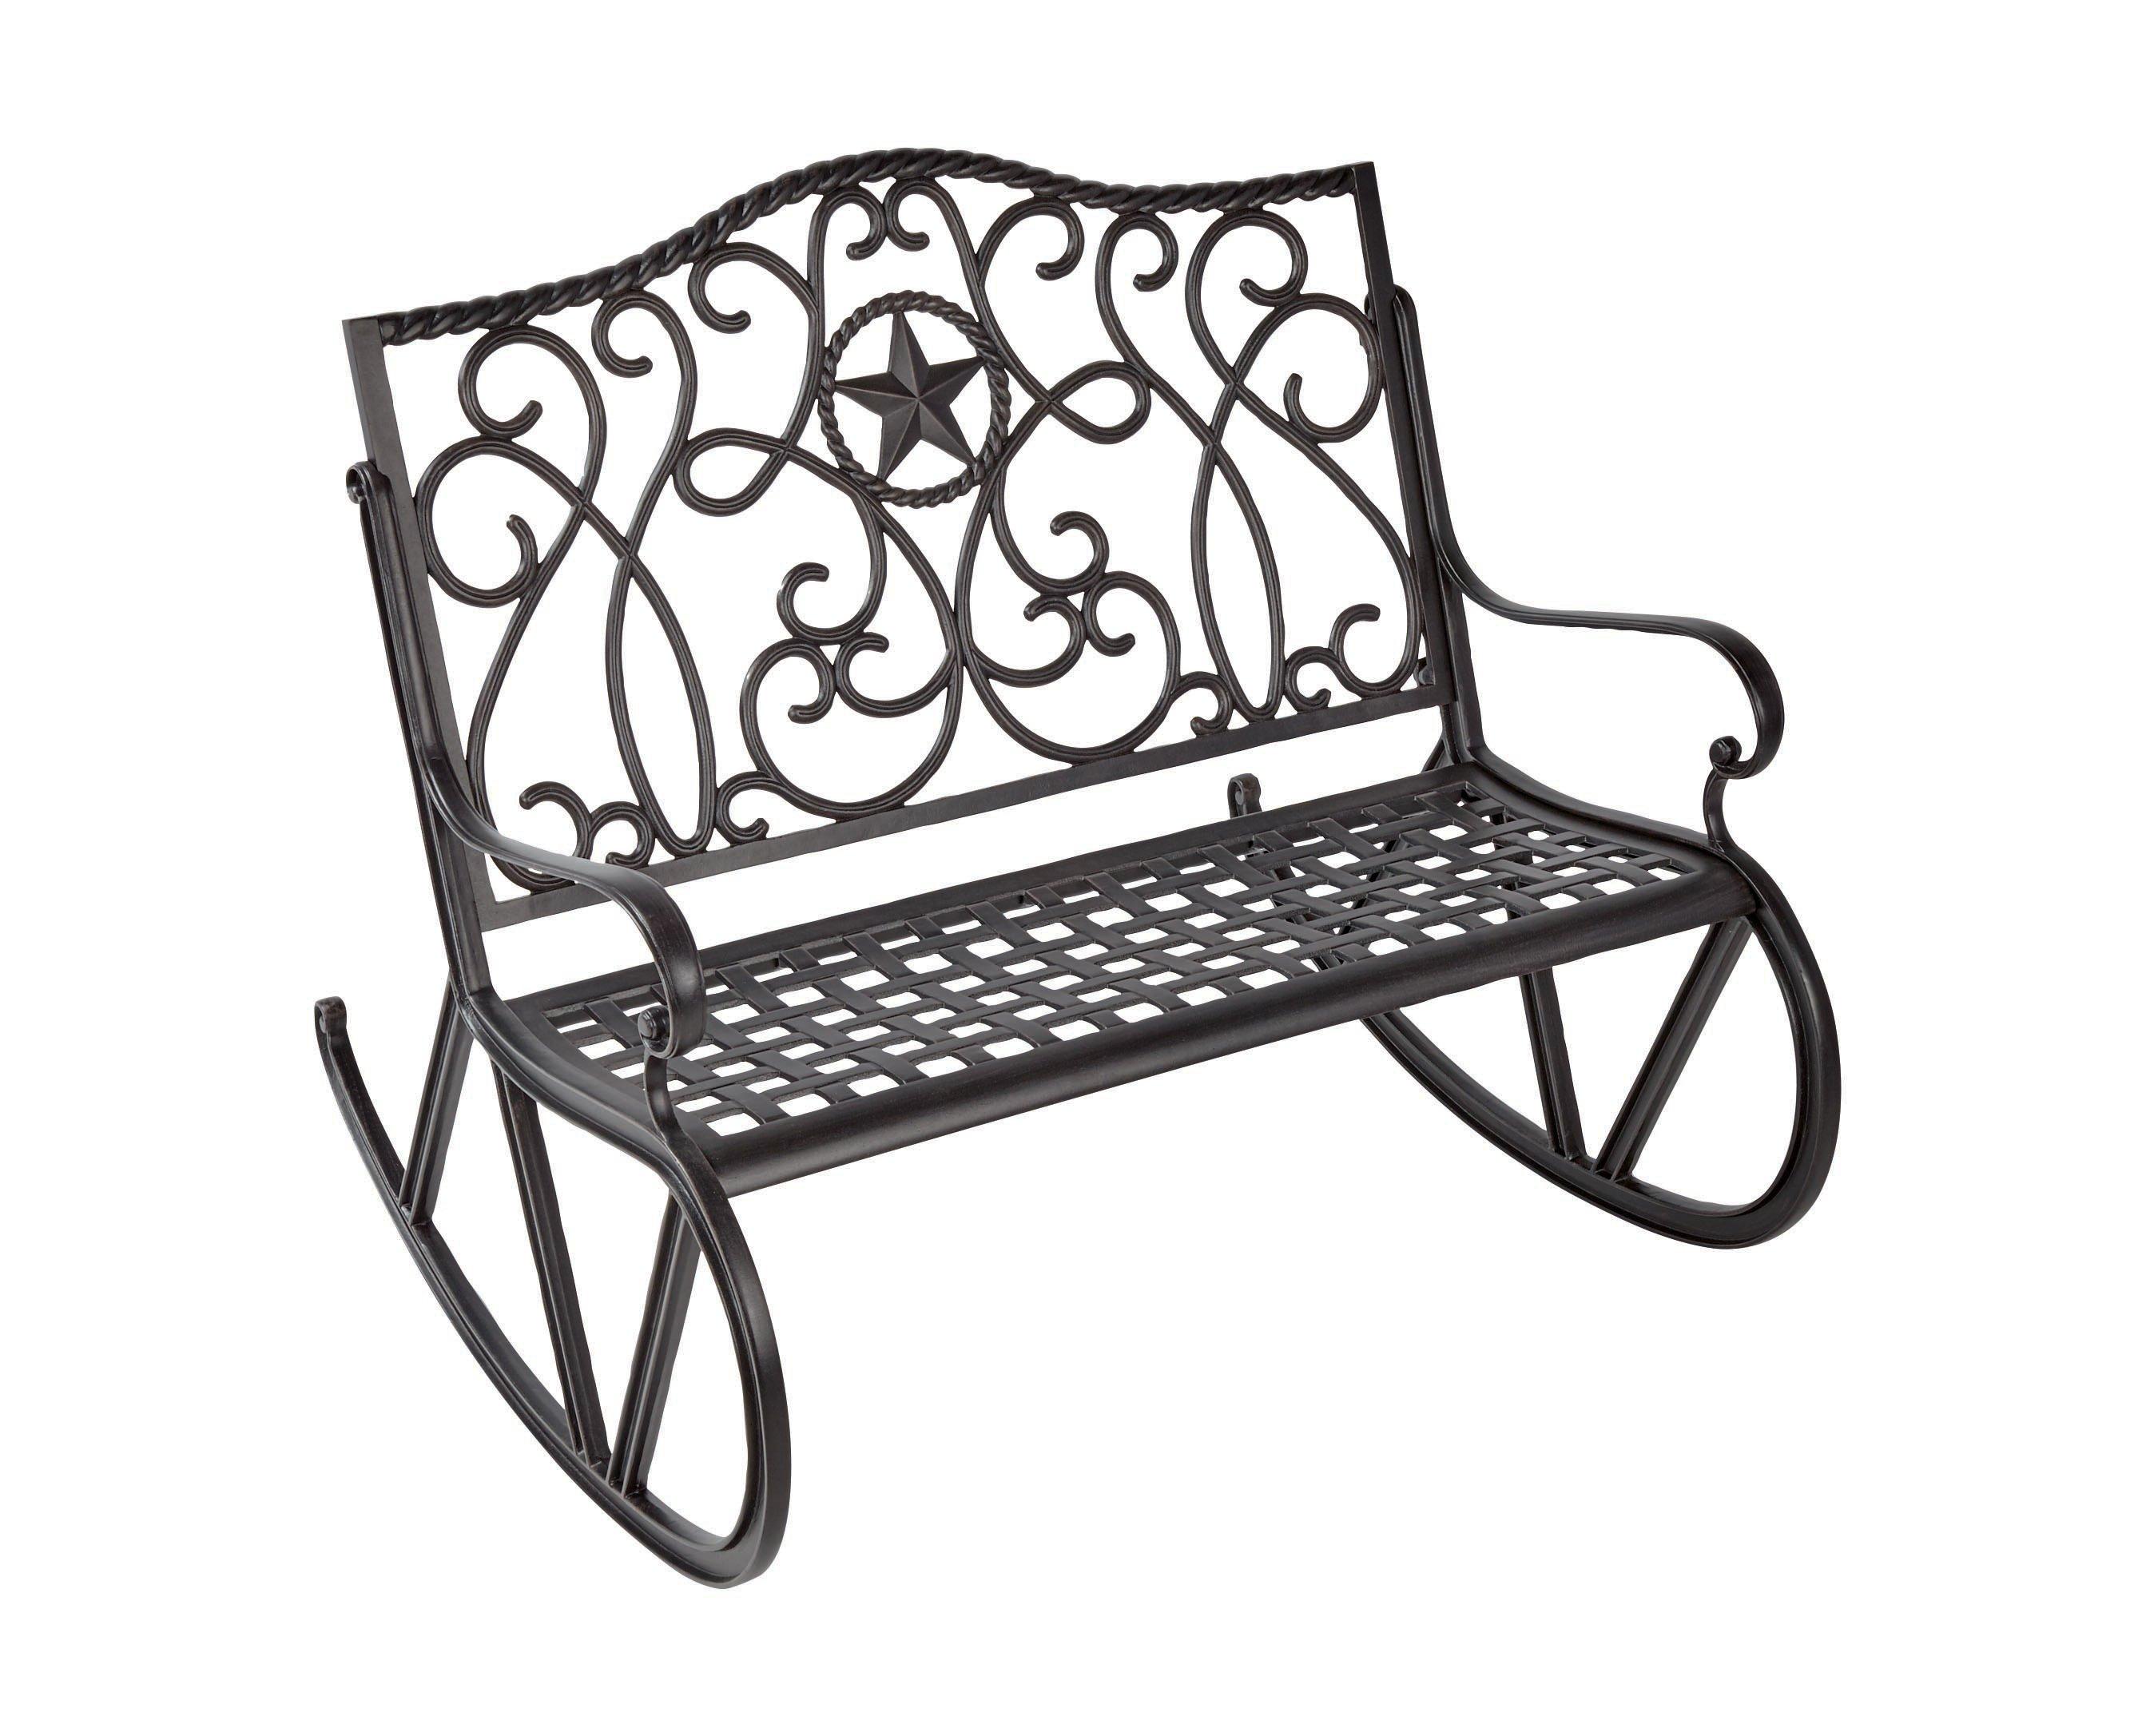 H‑E‑B Texas Backyard Riata III Rocking Bench ‑ Shop Furniture at HEB